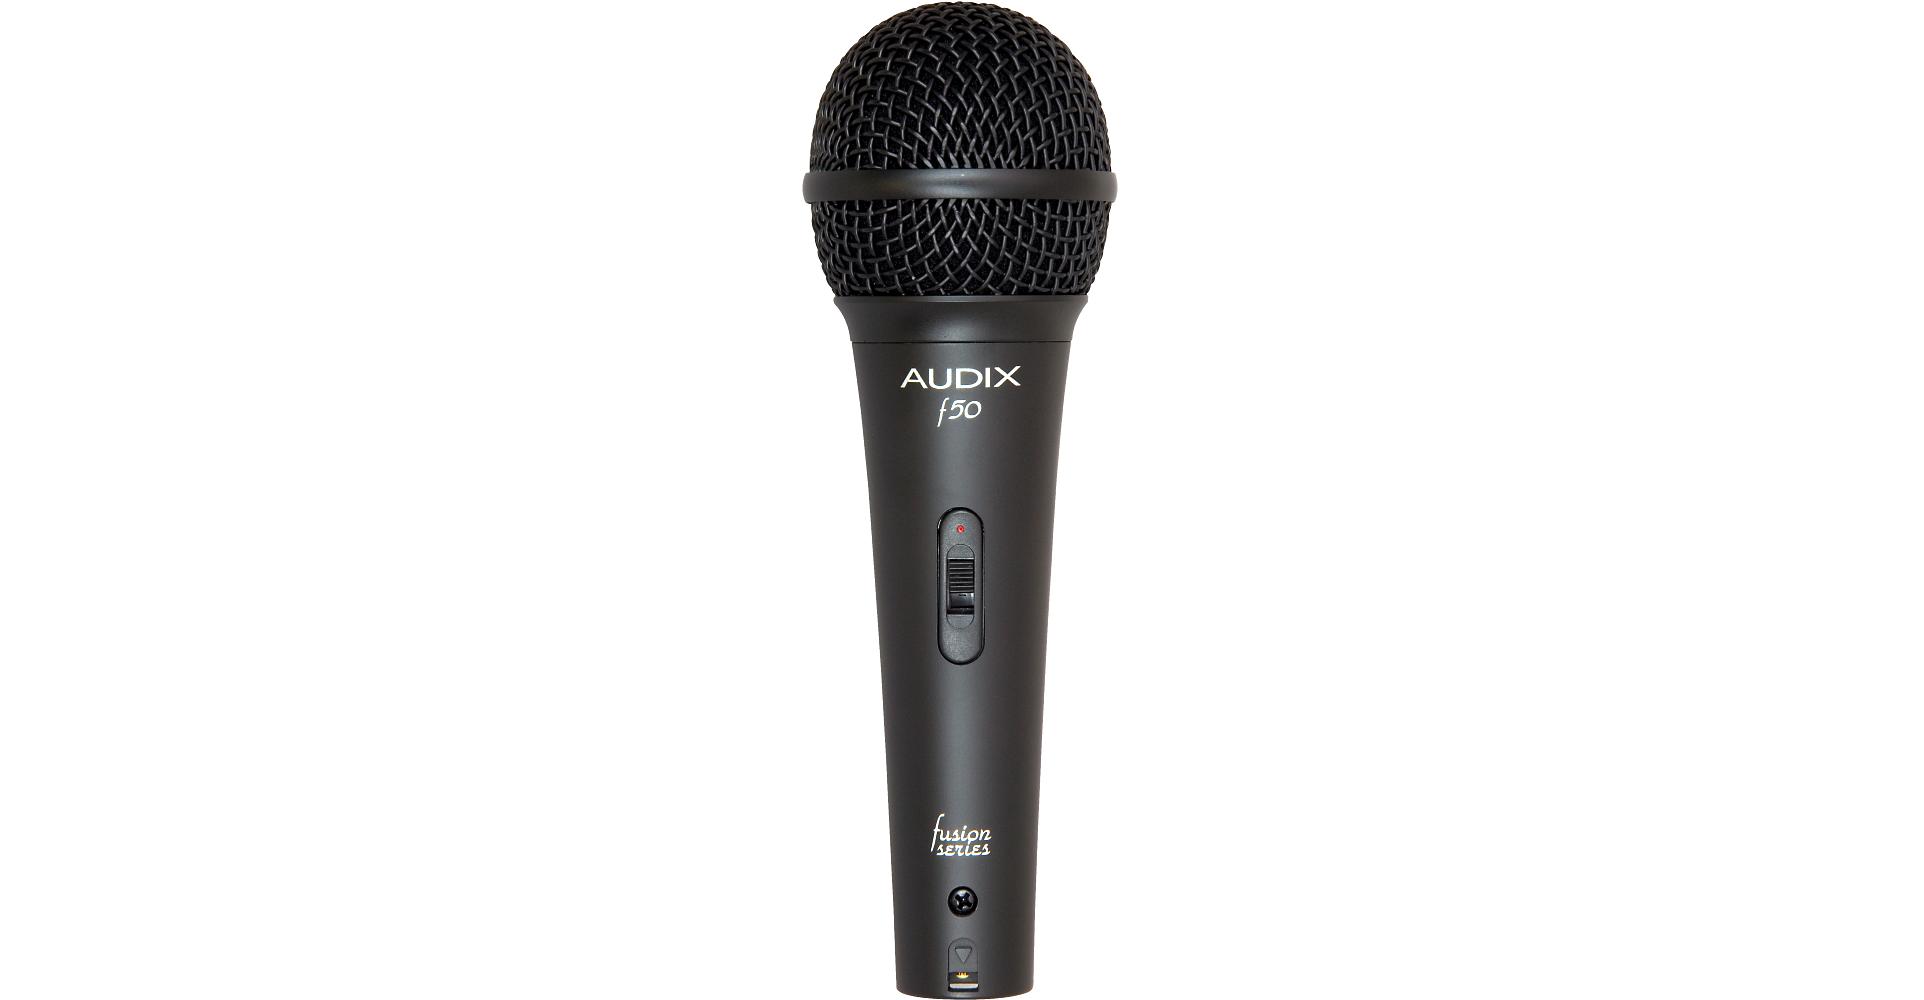 Audix Fusion F50 Microphone